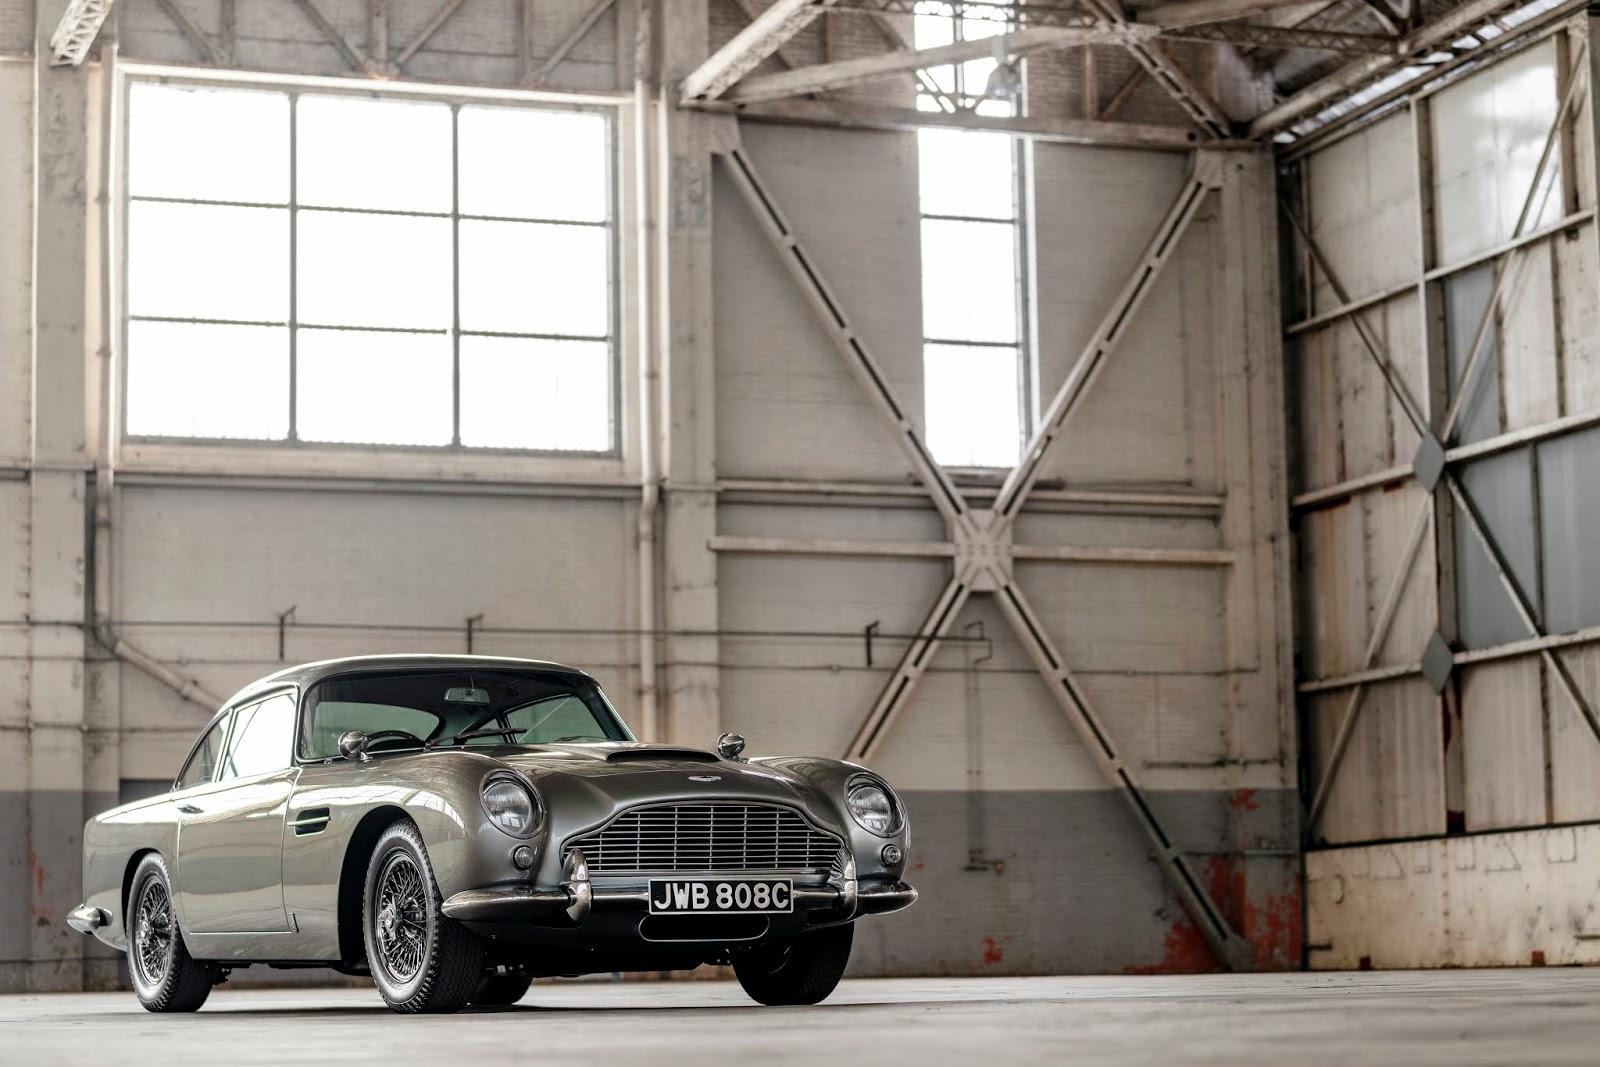 1963 1966 db5 21 1 Ταξιδεύοντας σαν άλλοτε, James Bond, με την Aston Martin DB5